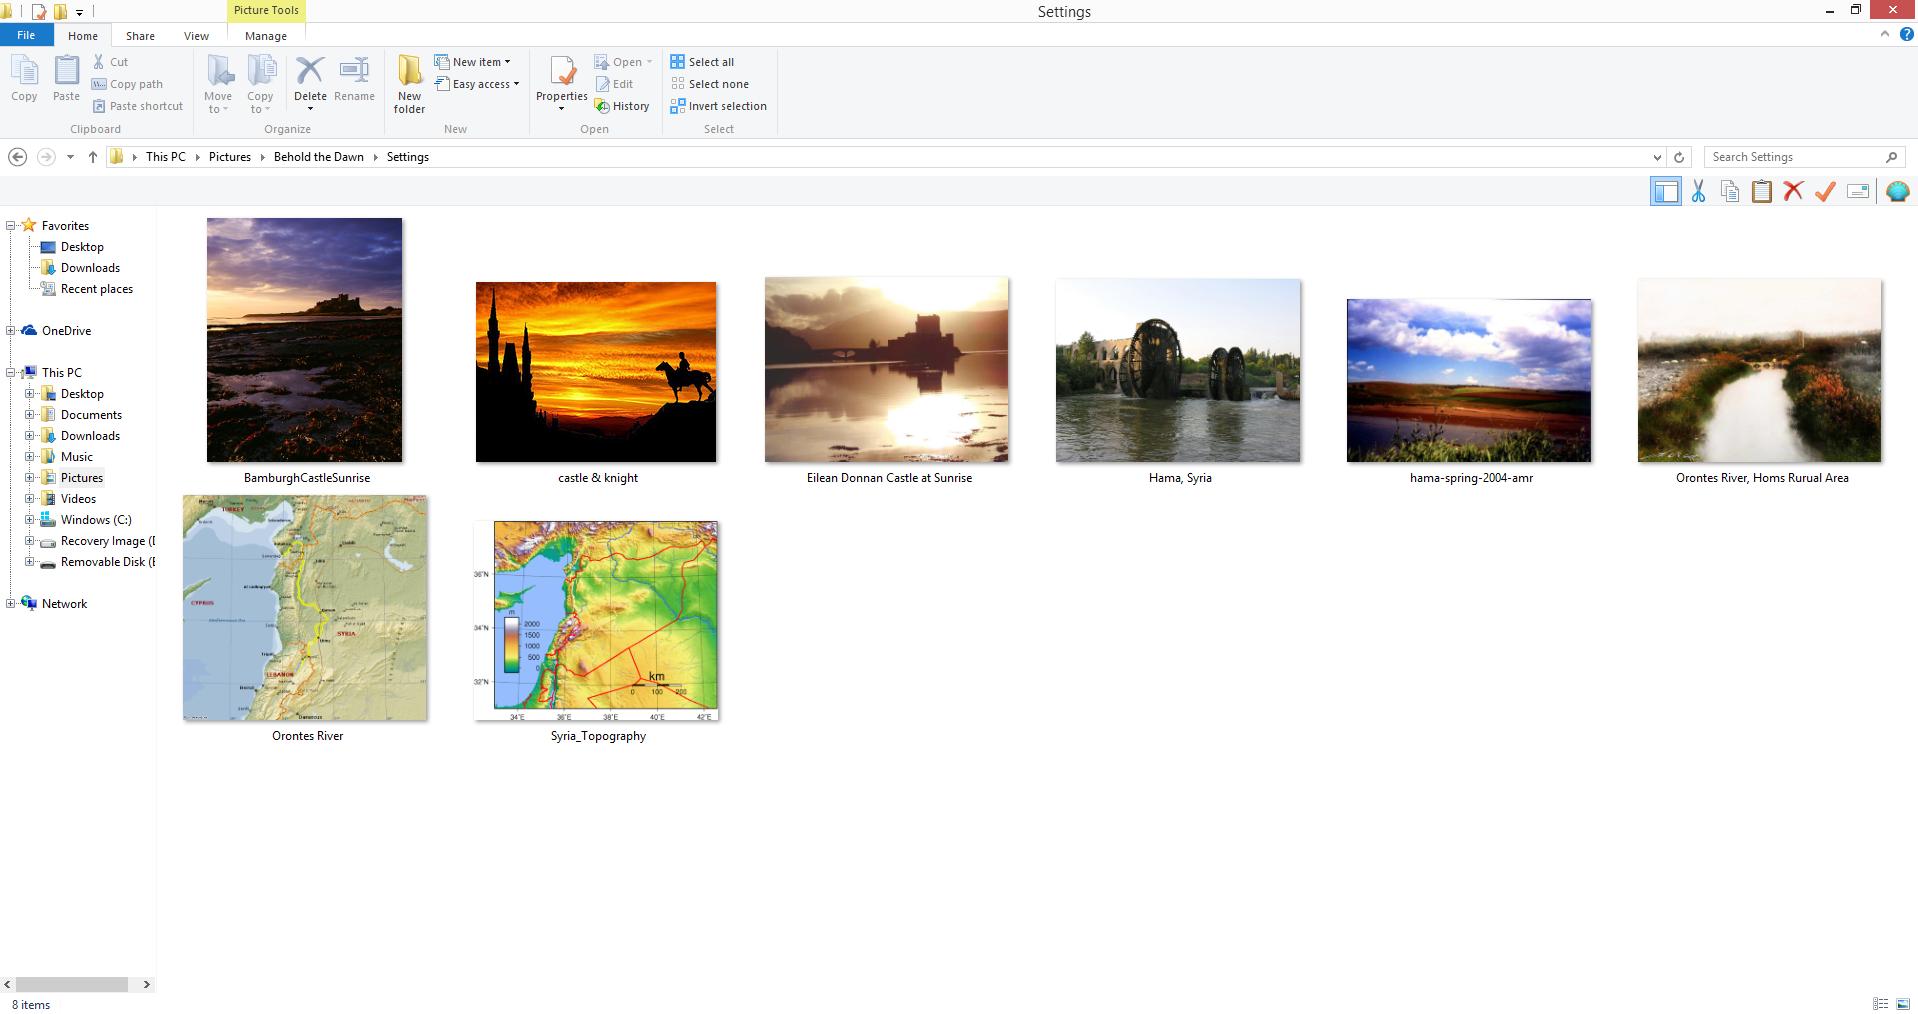 Behold the Dawn Settings Image Folder